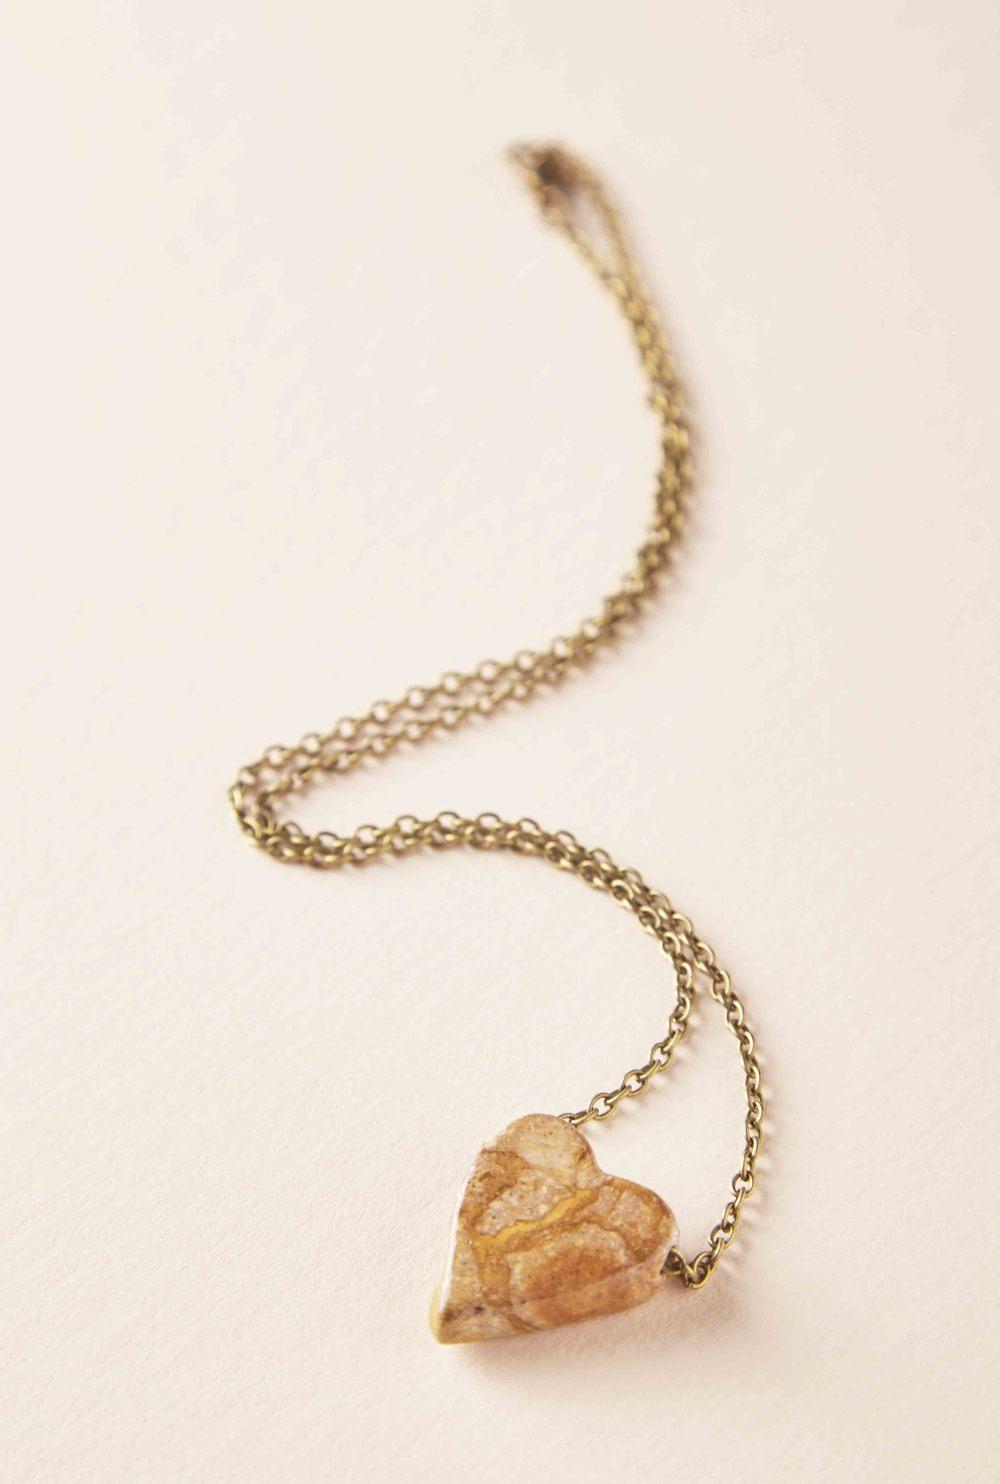 SHOP-PANAMA Belmont Heart Shaped Necklace.jpg